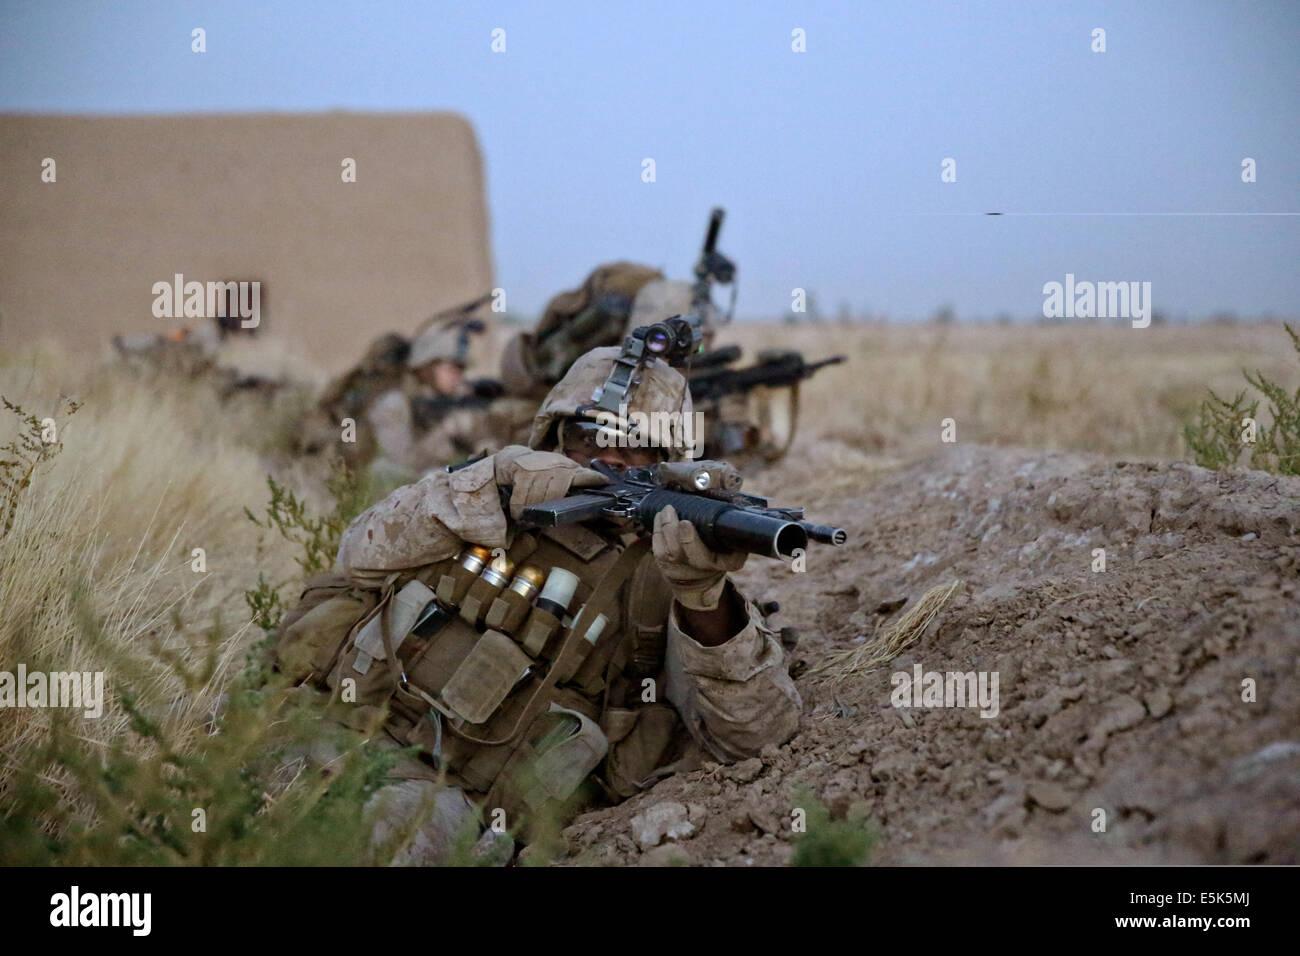 US Marine Cpl Deshaun Jackson, rifleman, Bravo Company, 1st Battalion, 7th Marine Regiment, takes cover behind a Stock Photo